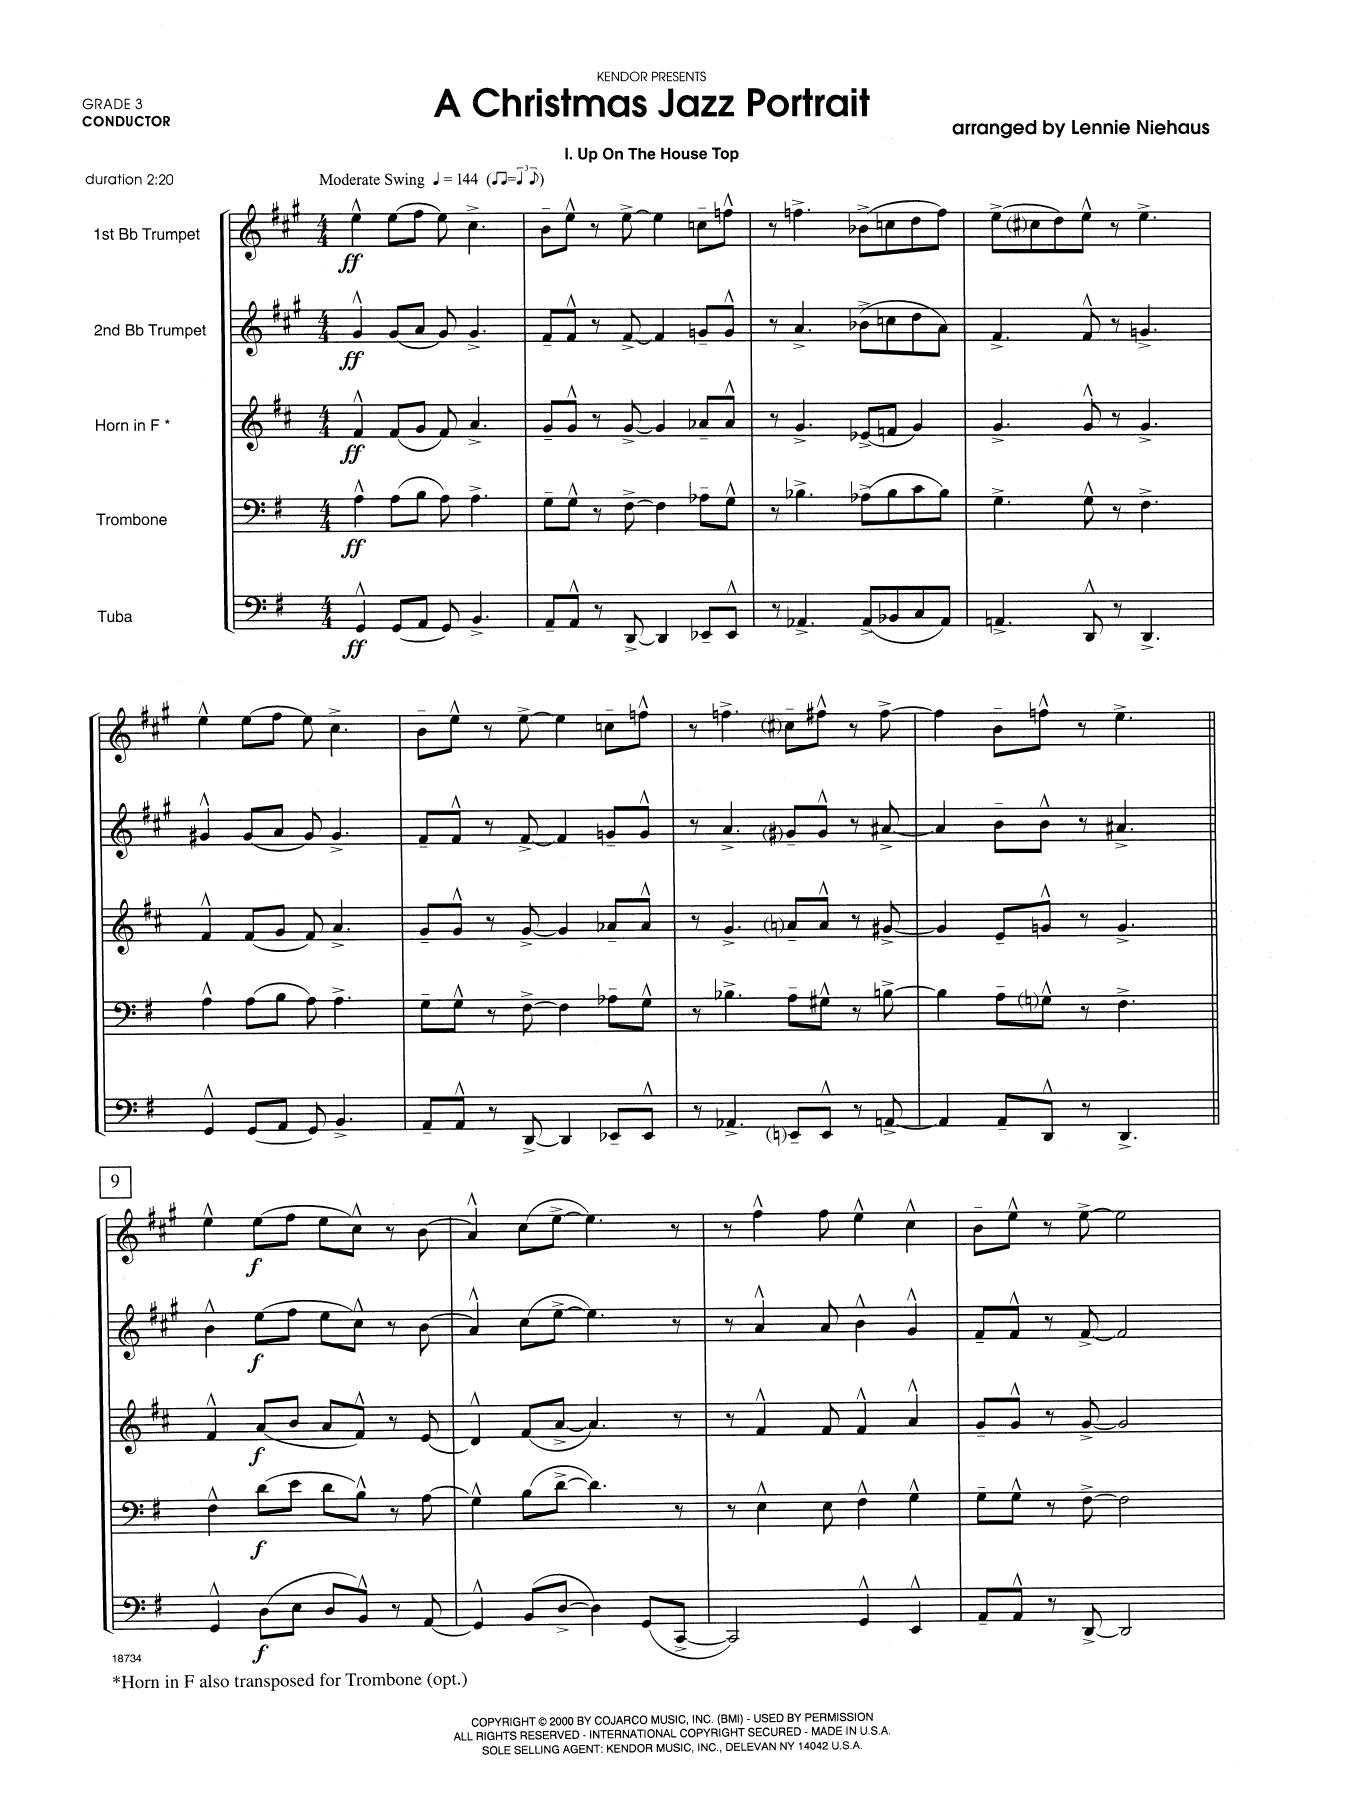 A Christmas Jazz Portrait (COMPLETE) sheet music for brass quintet by Lennie Niehaus